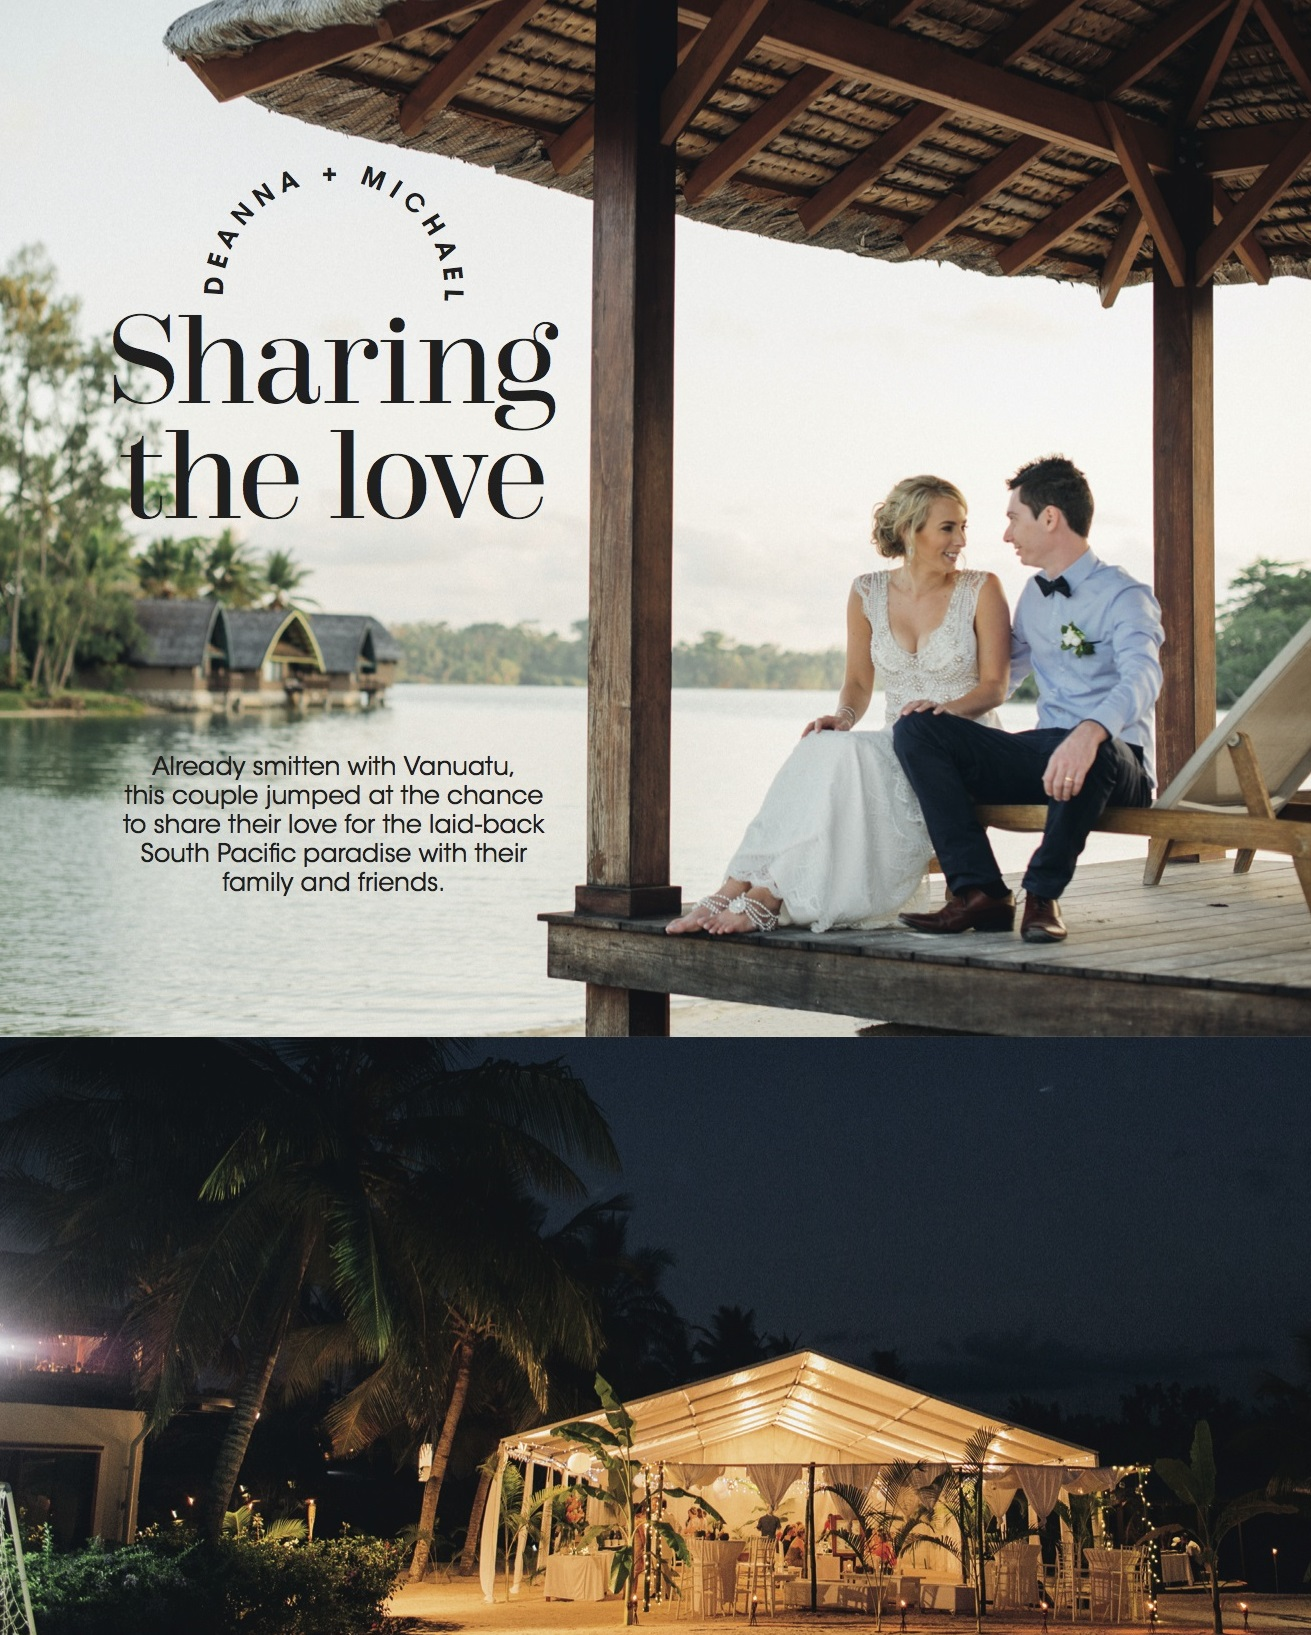 Soon to be married couple in Vanuatu Resort